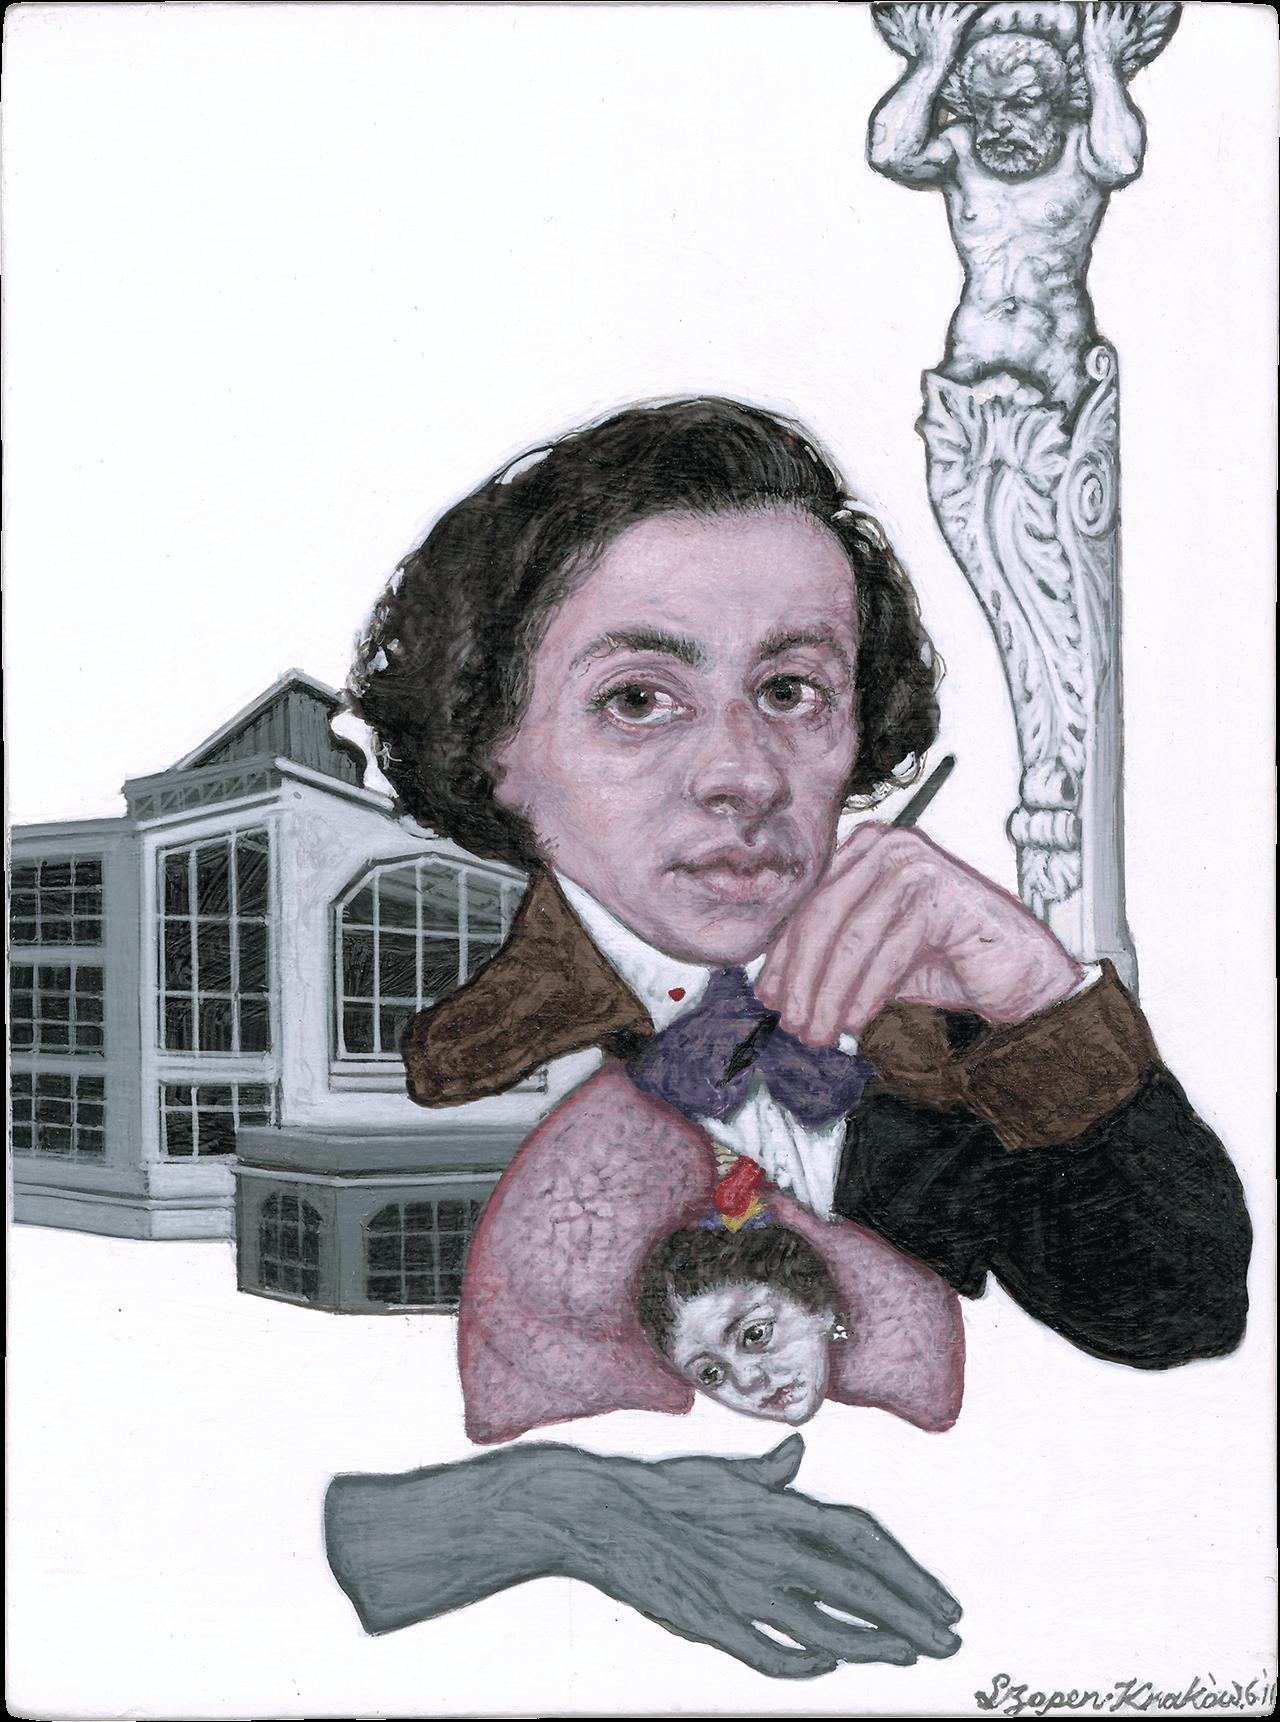 Fryderyk Szopen, 2011, τέμπερα σε χαρτόνι, 12x9,5 εκ.